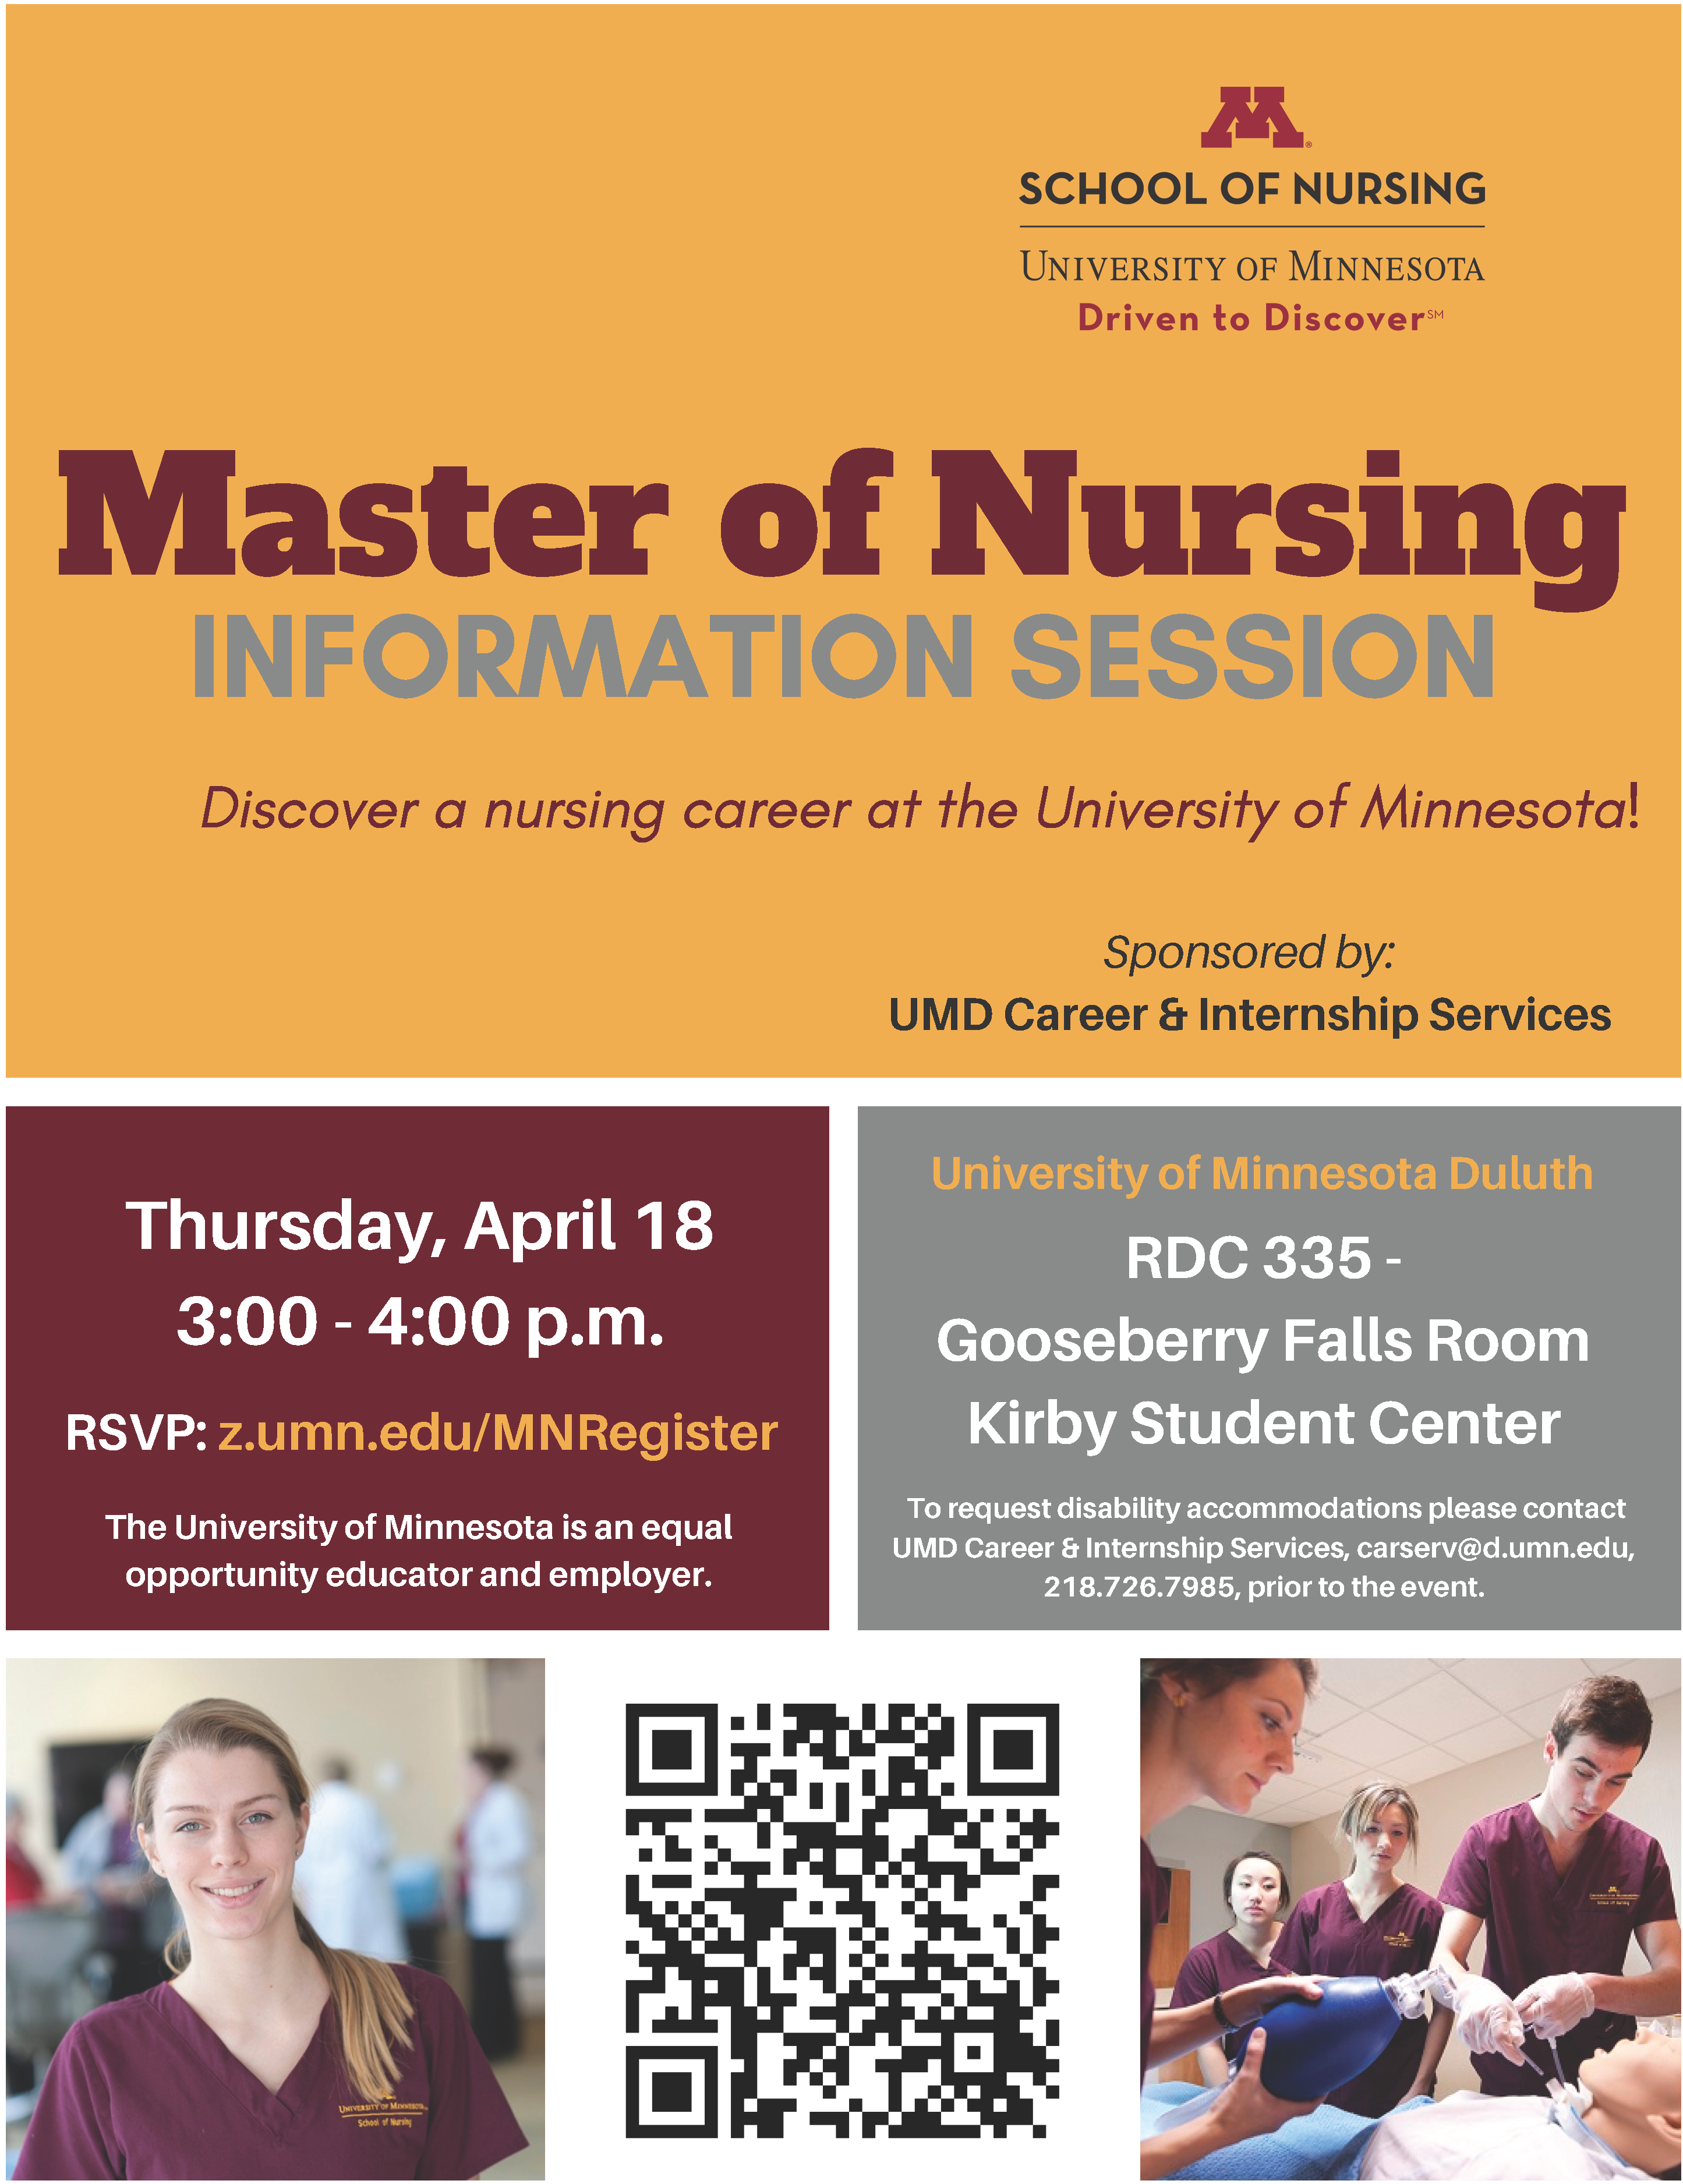 Nursing Program Event on April 18, 2019